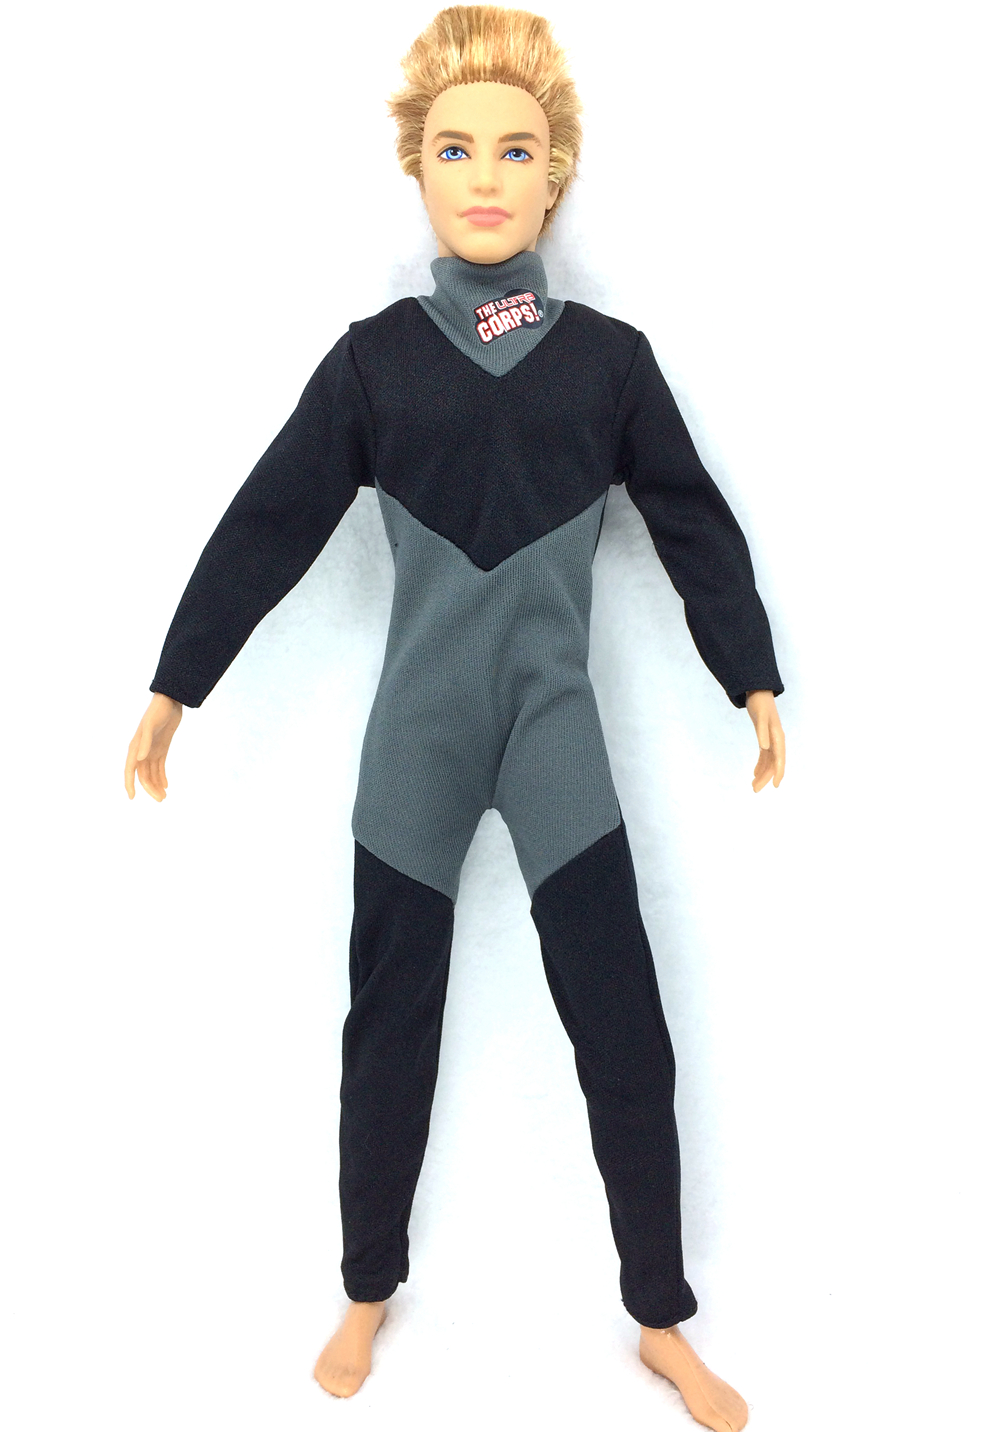 NK Unique Prince Garments Fight Diver Uniform Outfit For Barbie Boy Male Ken Doll For LANARD 1/6 Soldier Doll 012D